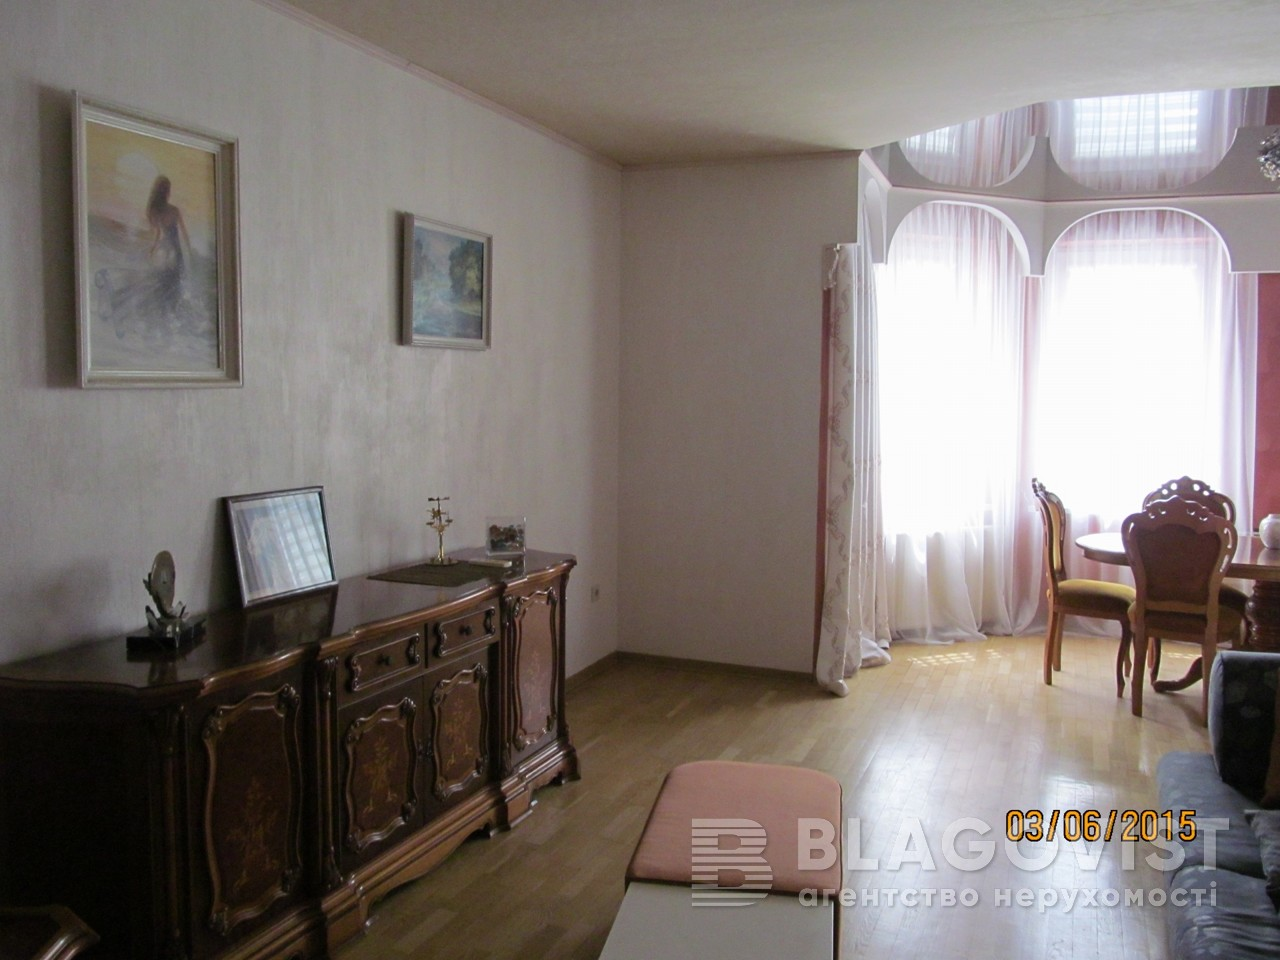 Квартира C-101503, Мельникова, 83д, Киев - Фото 3